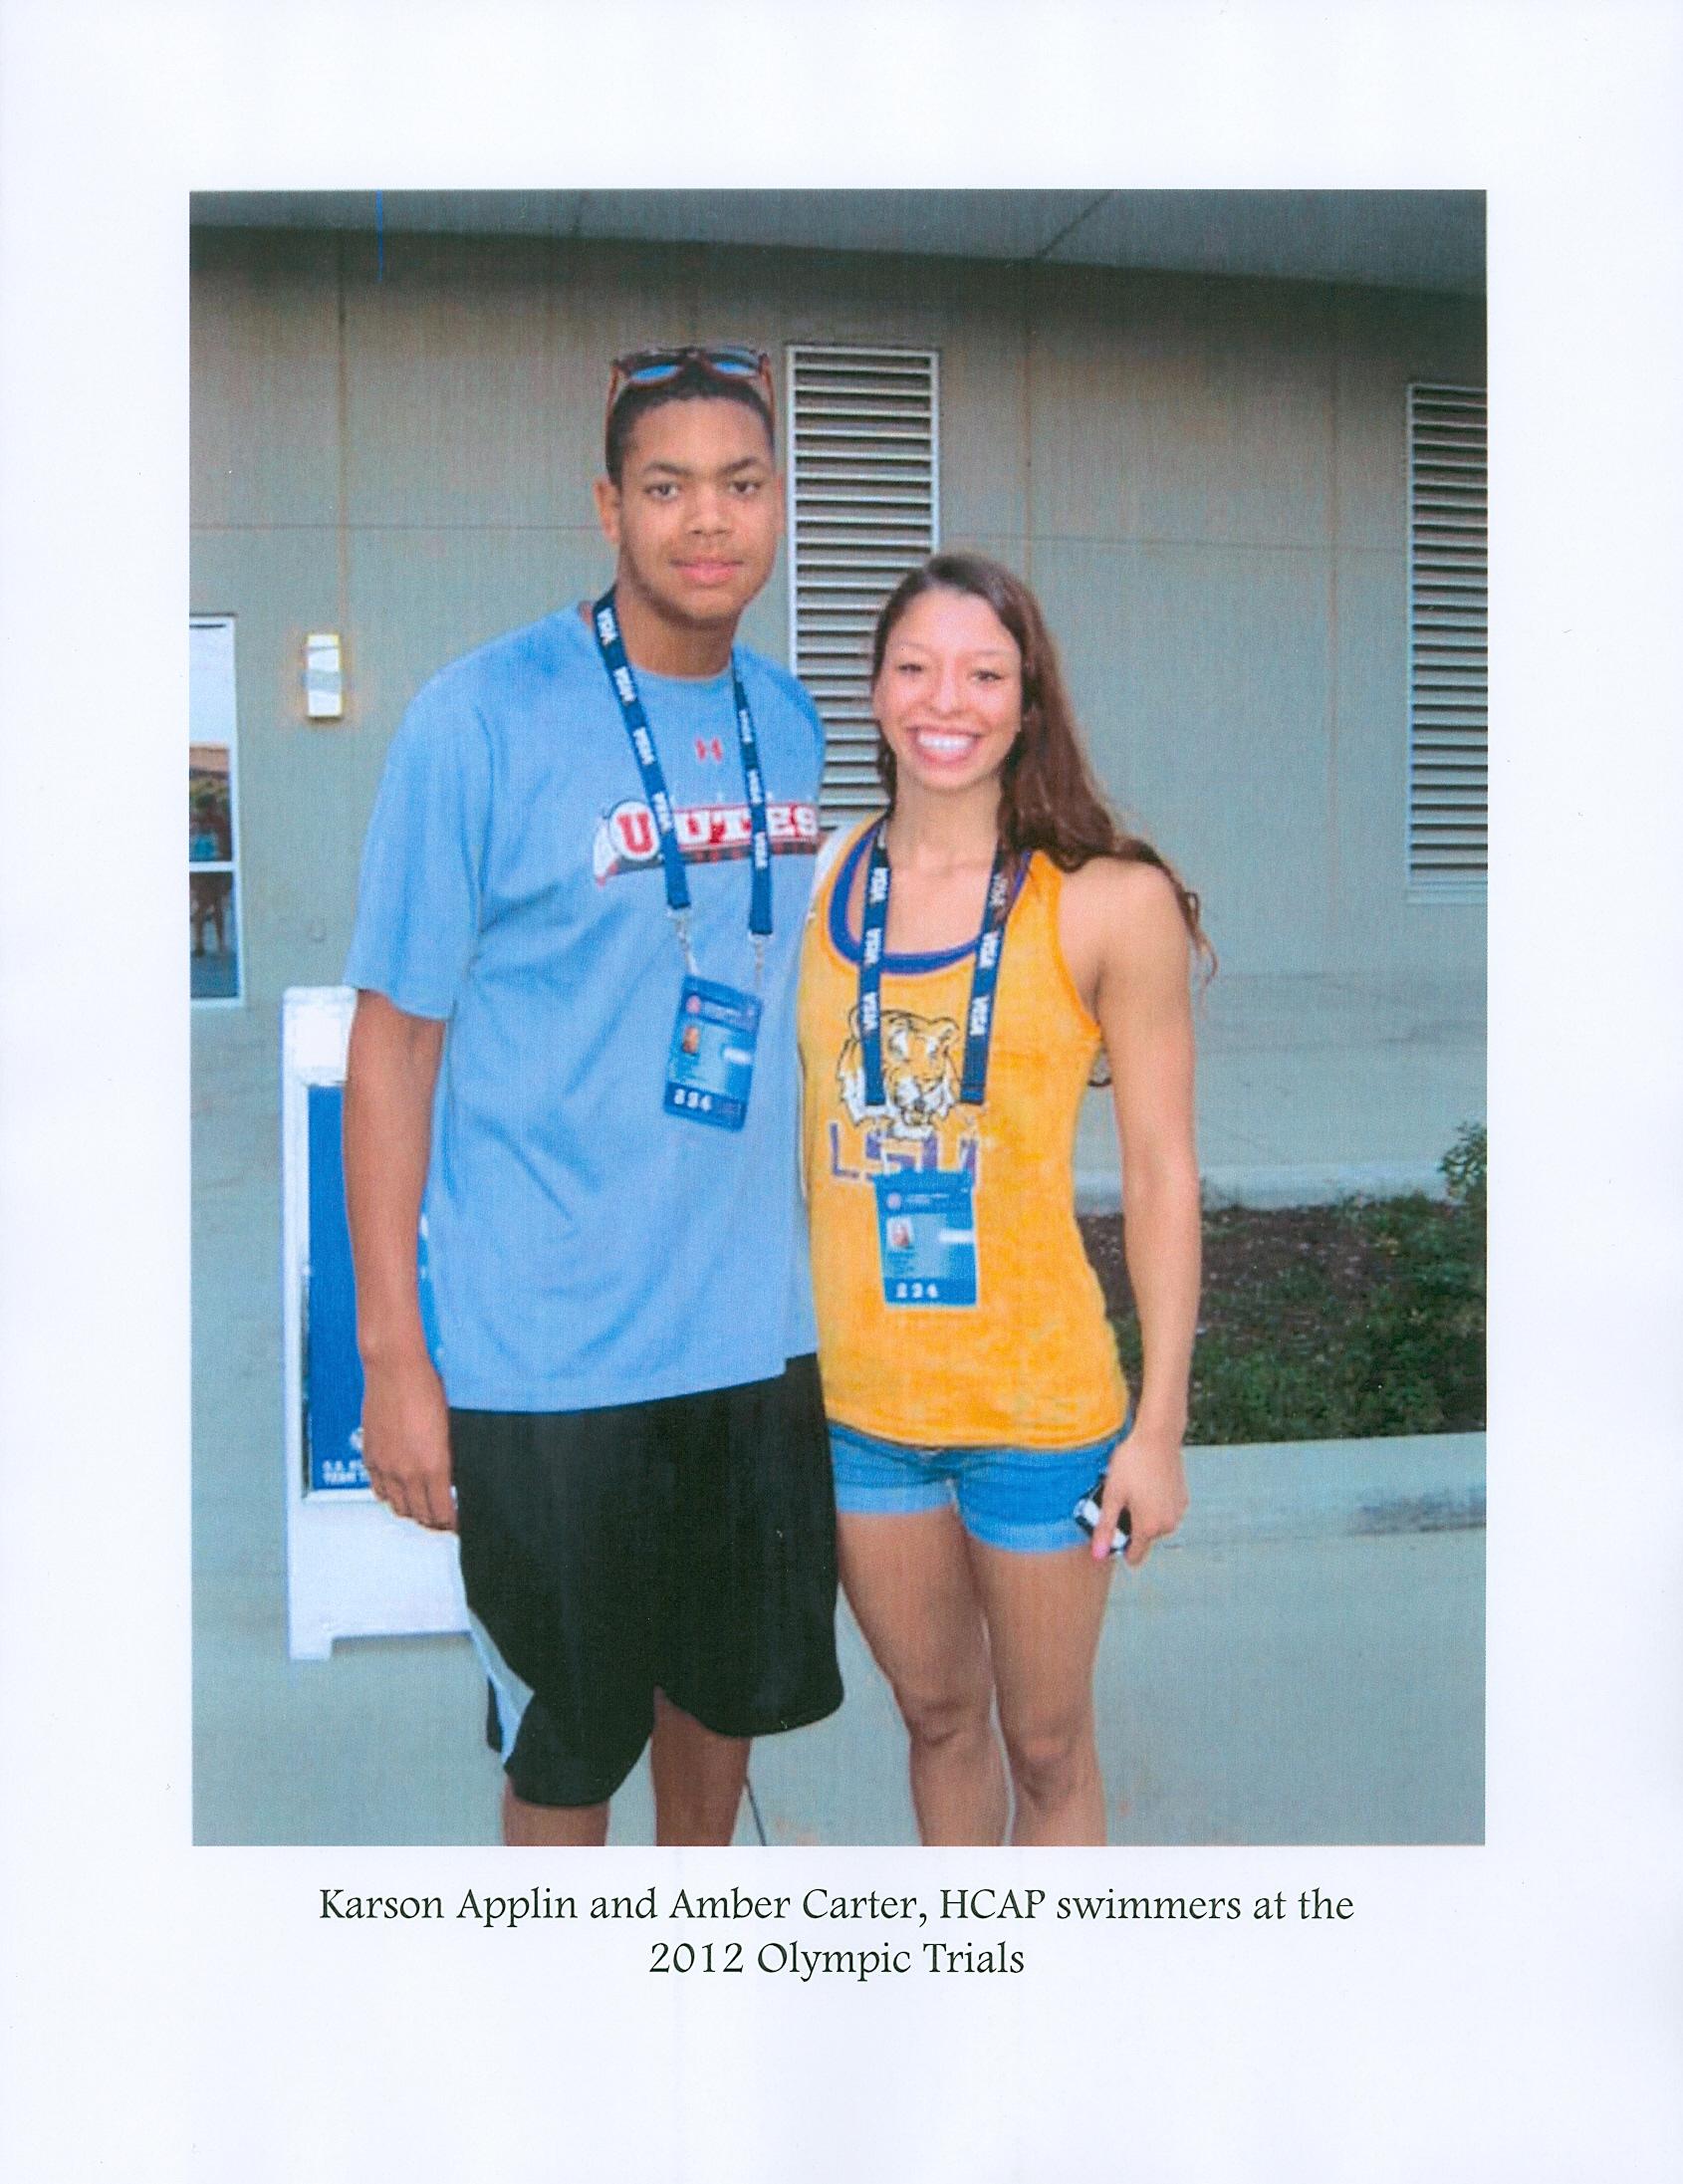 Karson and Amber.jpg